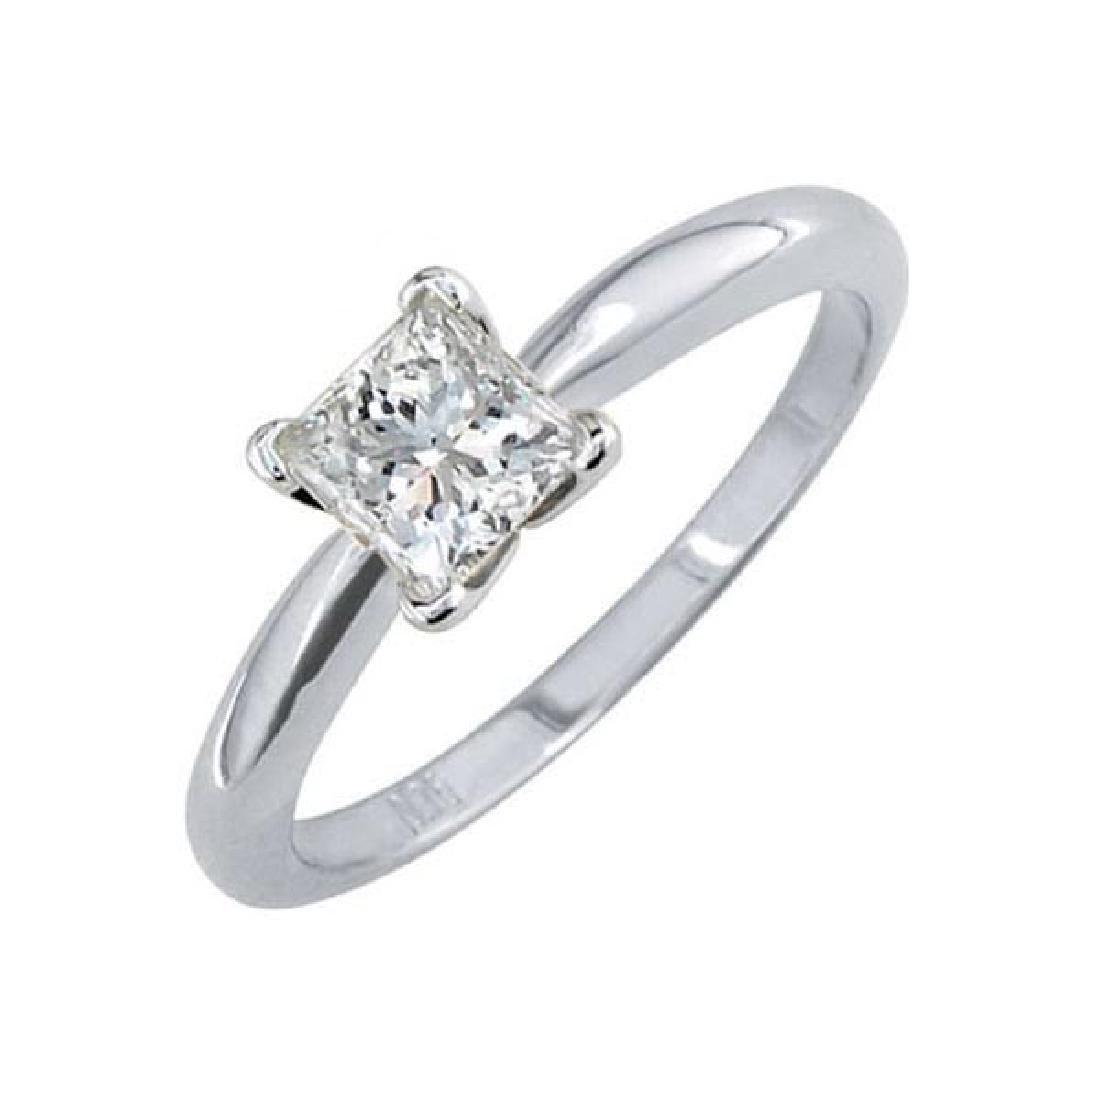 Certified 0.96 CTW Princess Diamond Solitaire 14k Ring